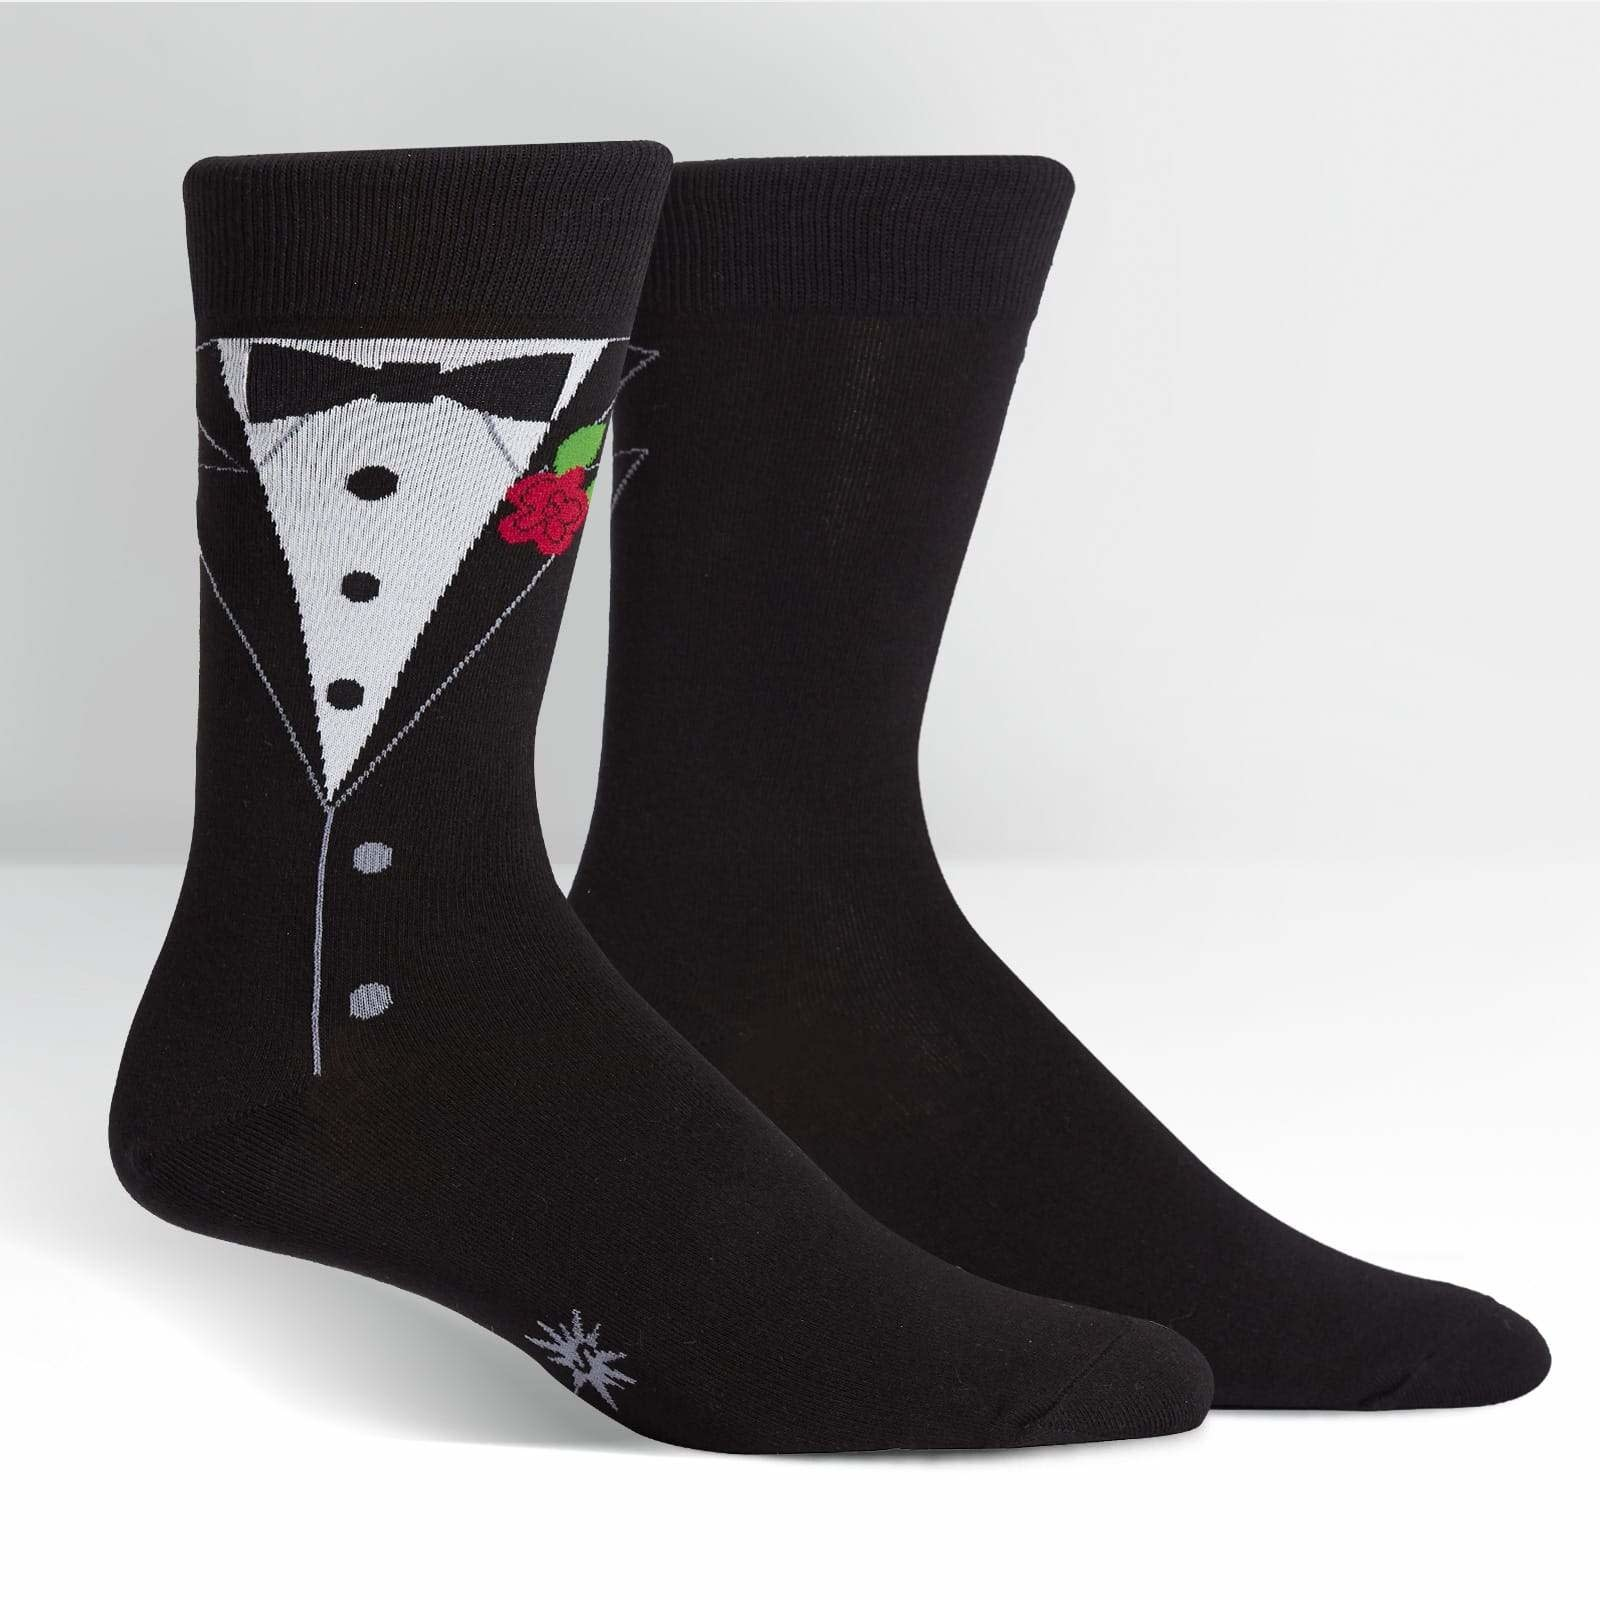 Black Tie Affair Crew Socks